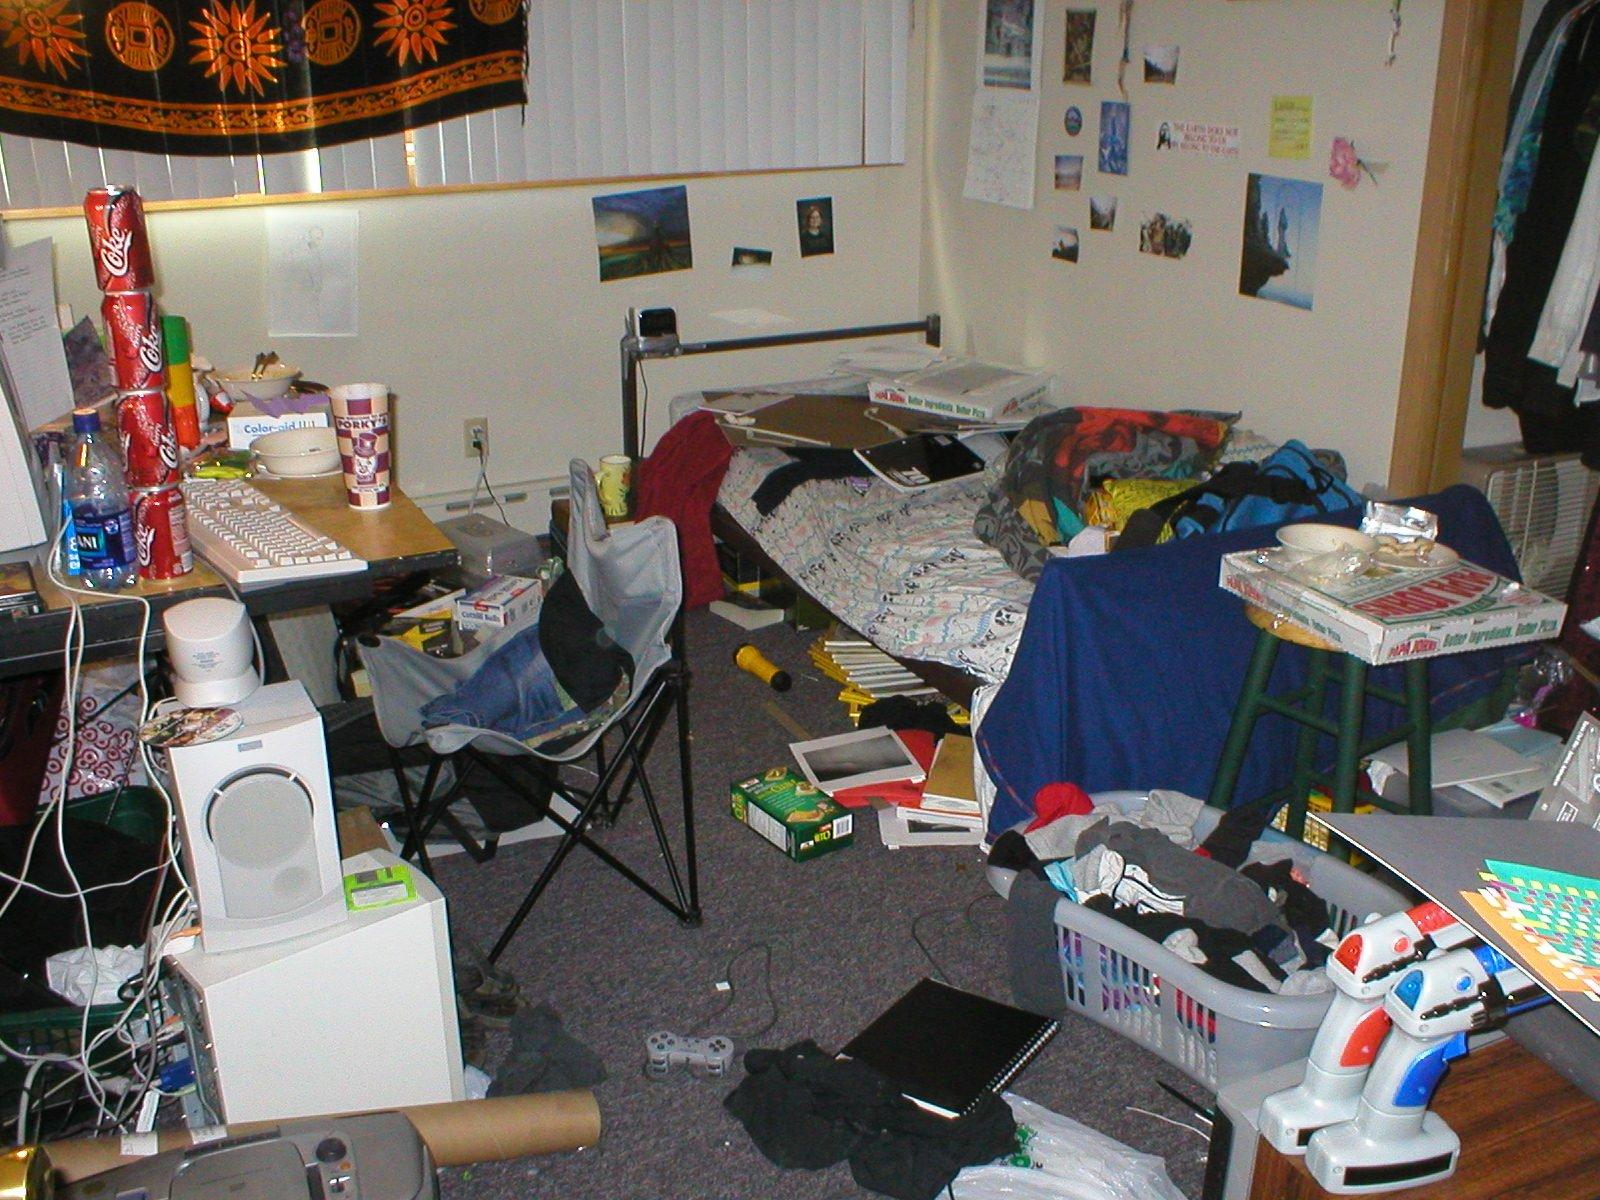 dorm_room_disaster